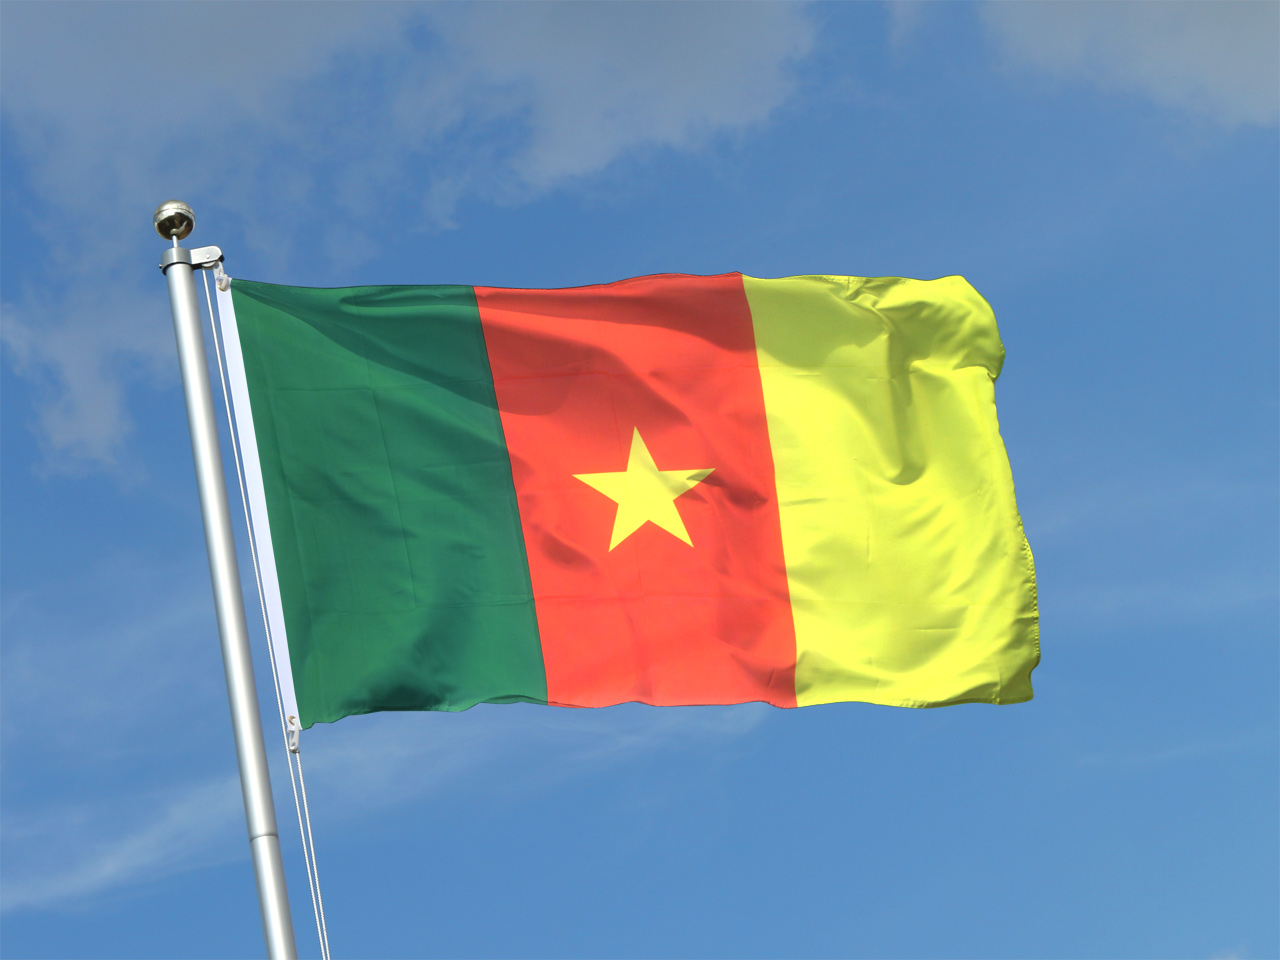 hymne national du Cameroun